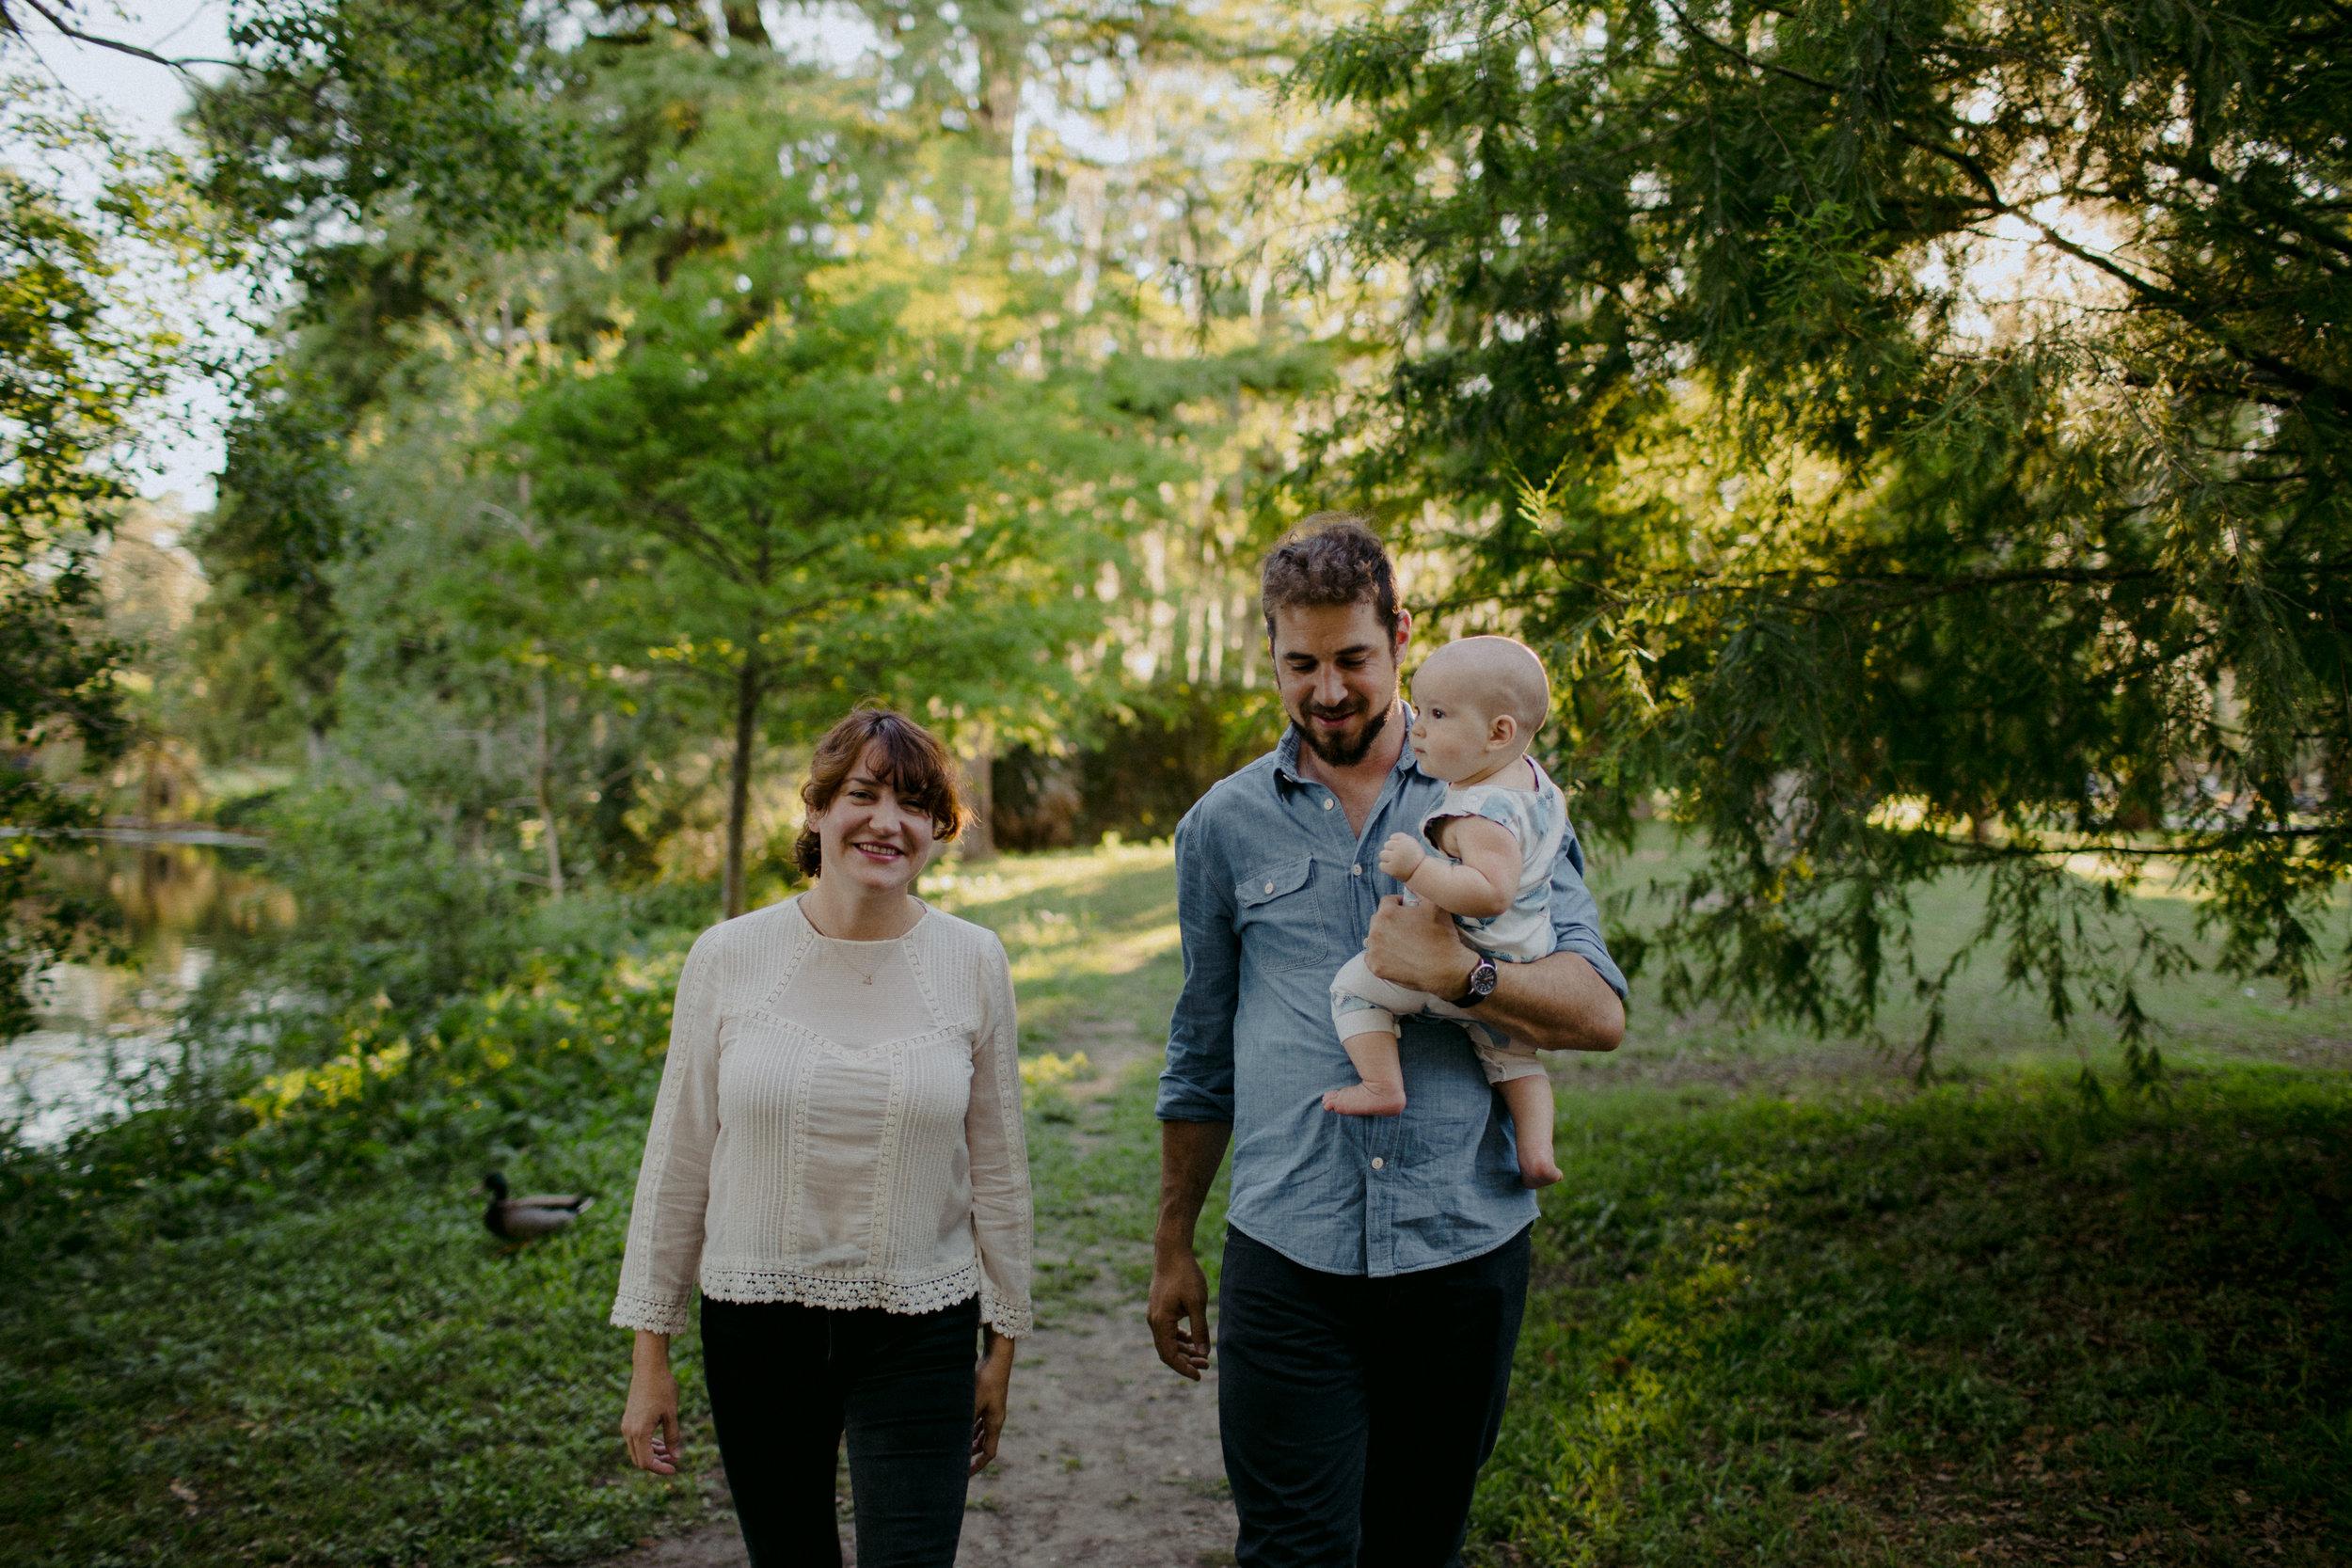 audubon park family shoot-sharon pye-14.jpg